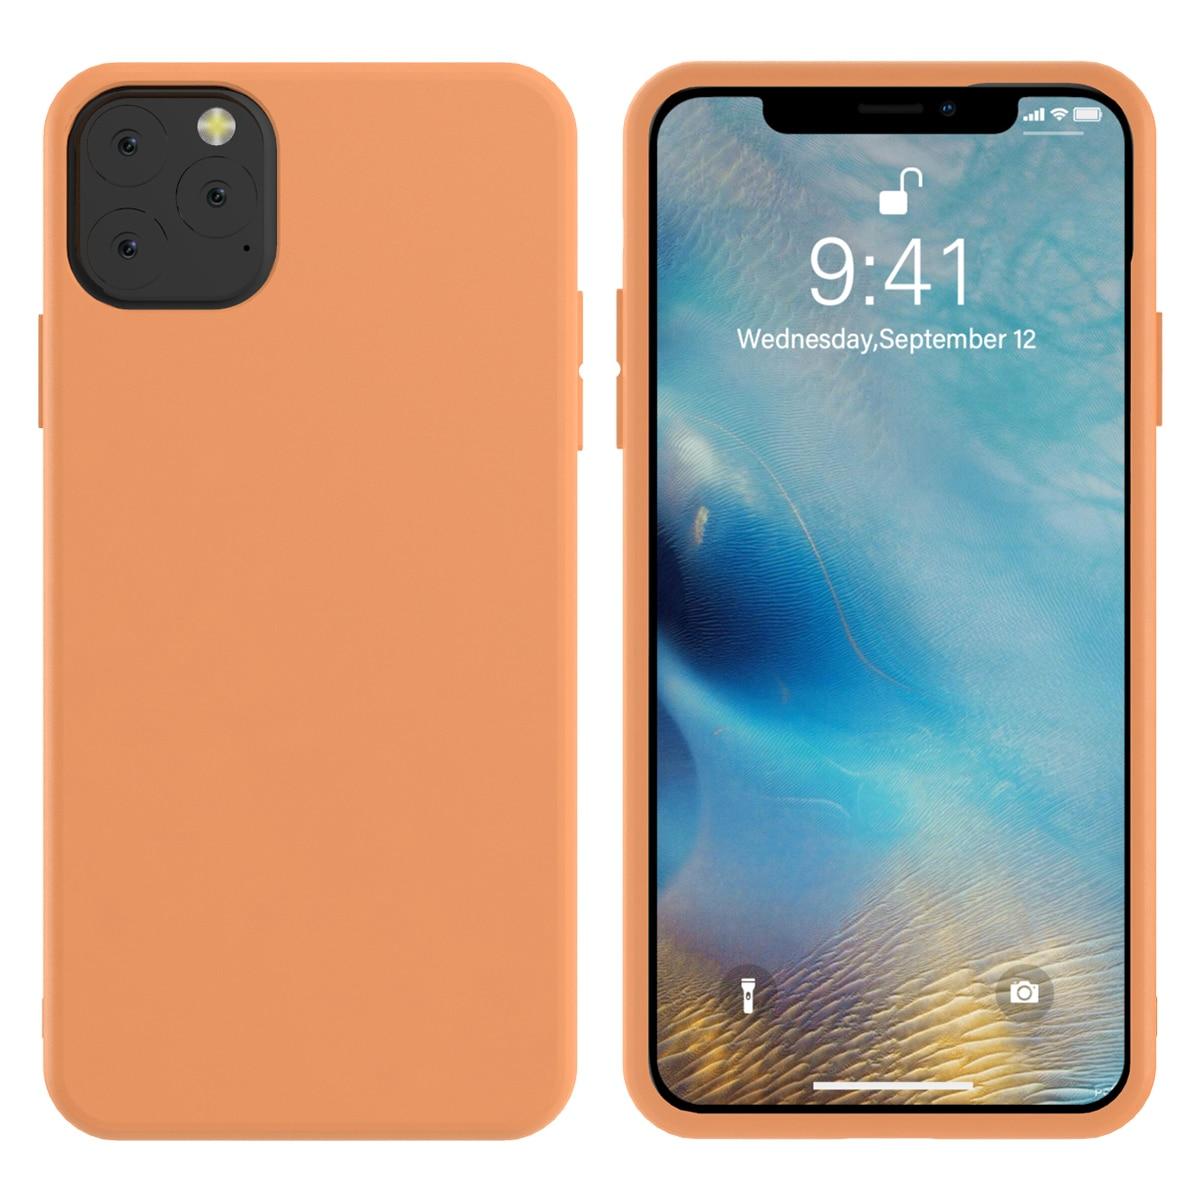 Torubia Silicone Case for iPhone 11/11 Pro/11 Pro Max 31